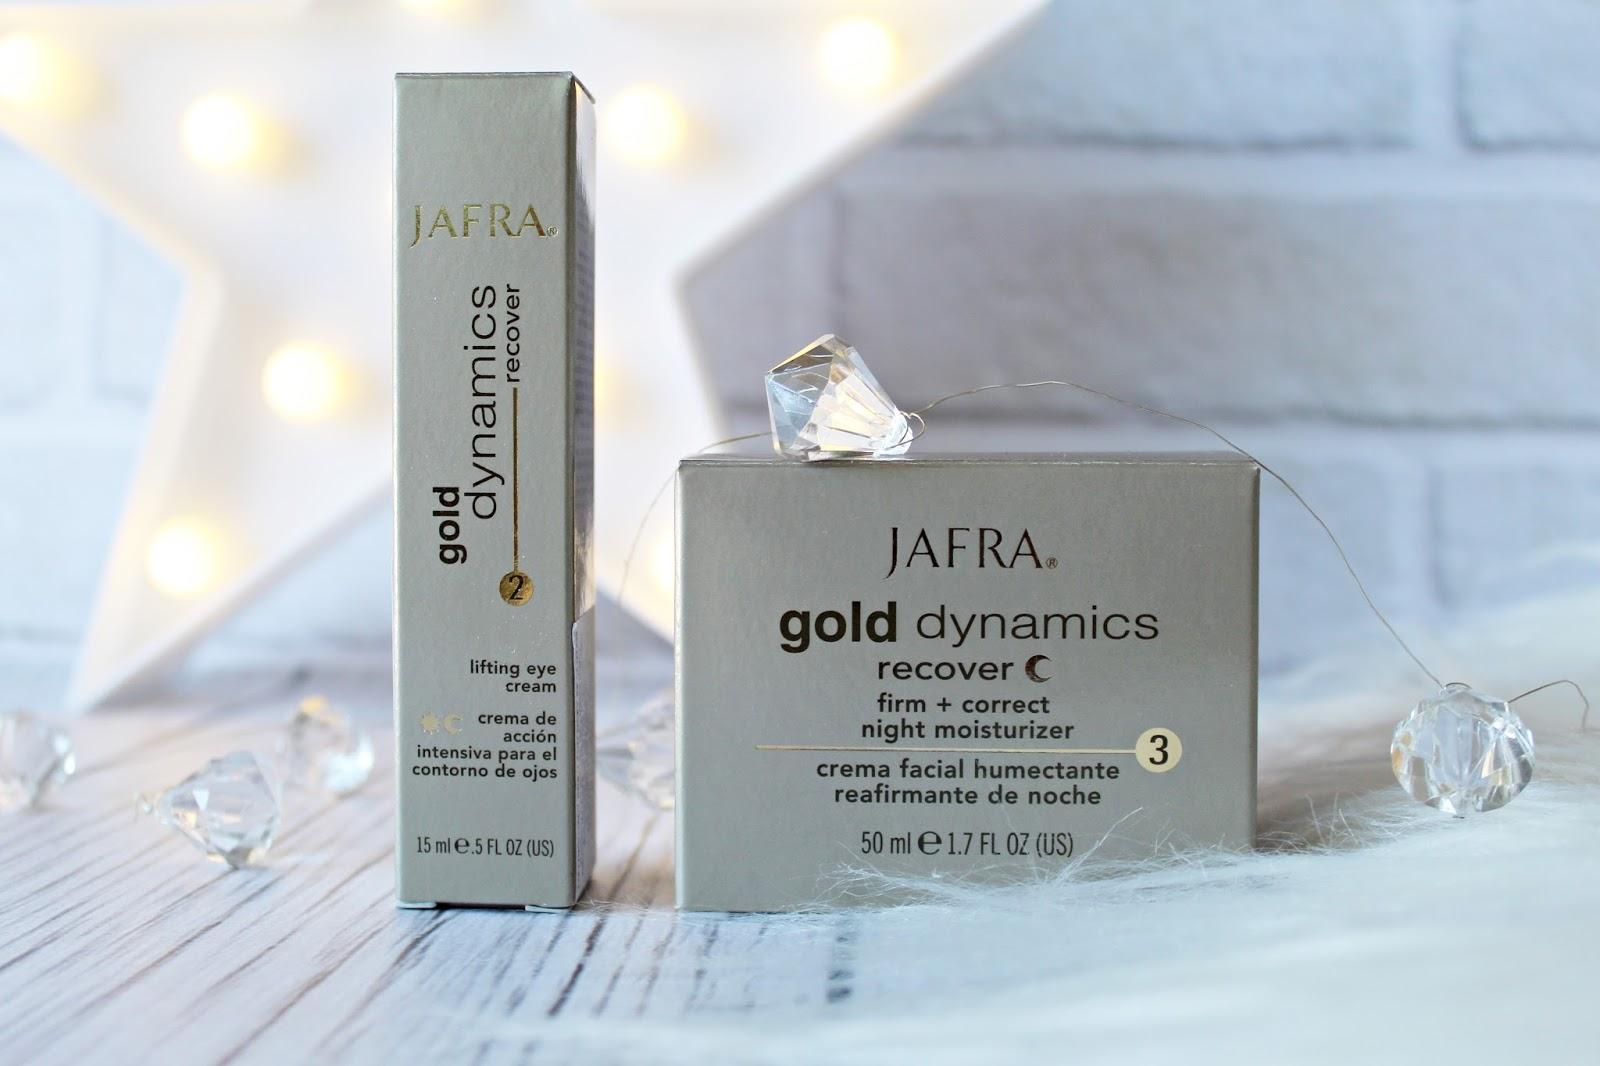 JAFRA Gold Dynamics recover - Krem ze złotem na noc + liftingujący krem pod oczy